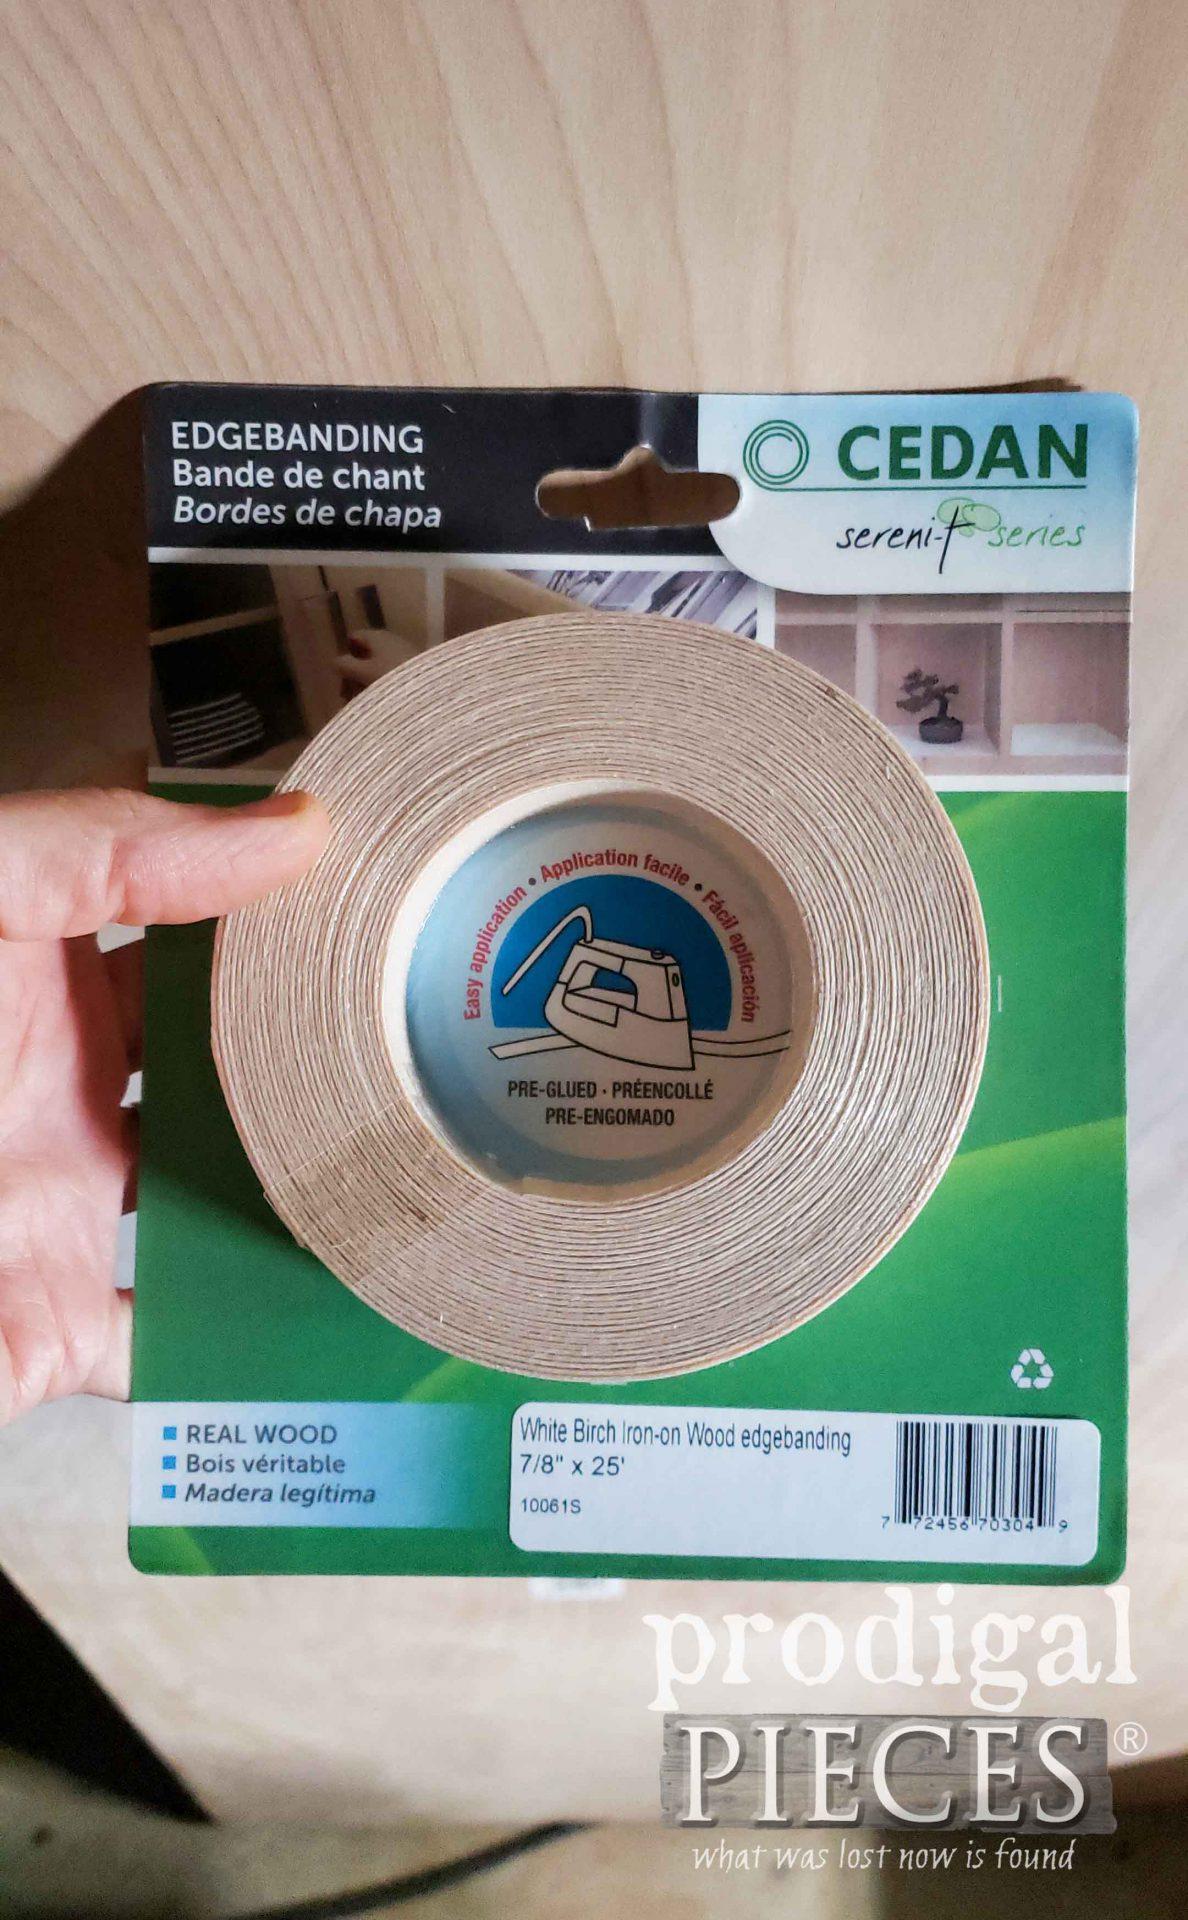 Birch Plywood Edgebanding for Desk Top | prodigalpieces.com